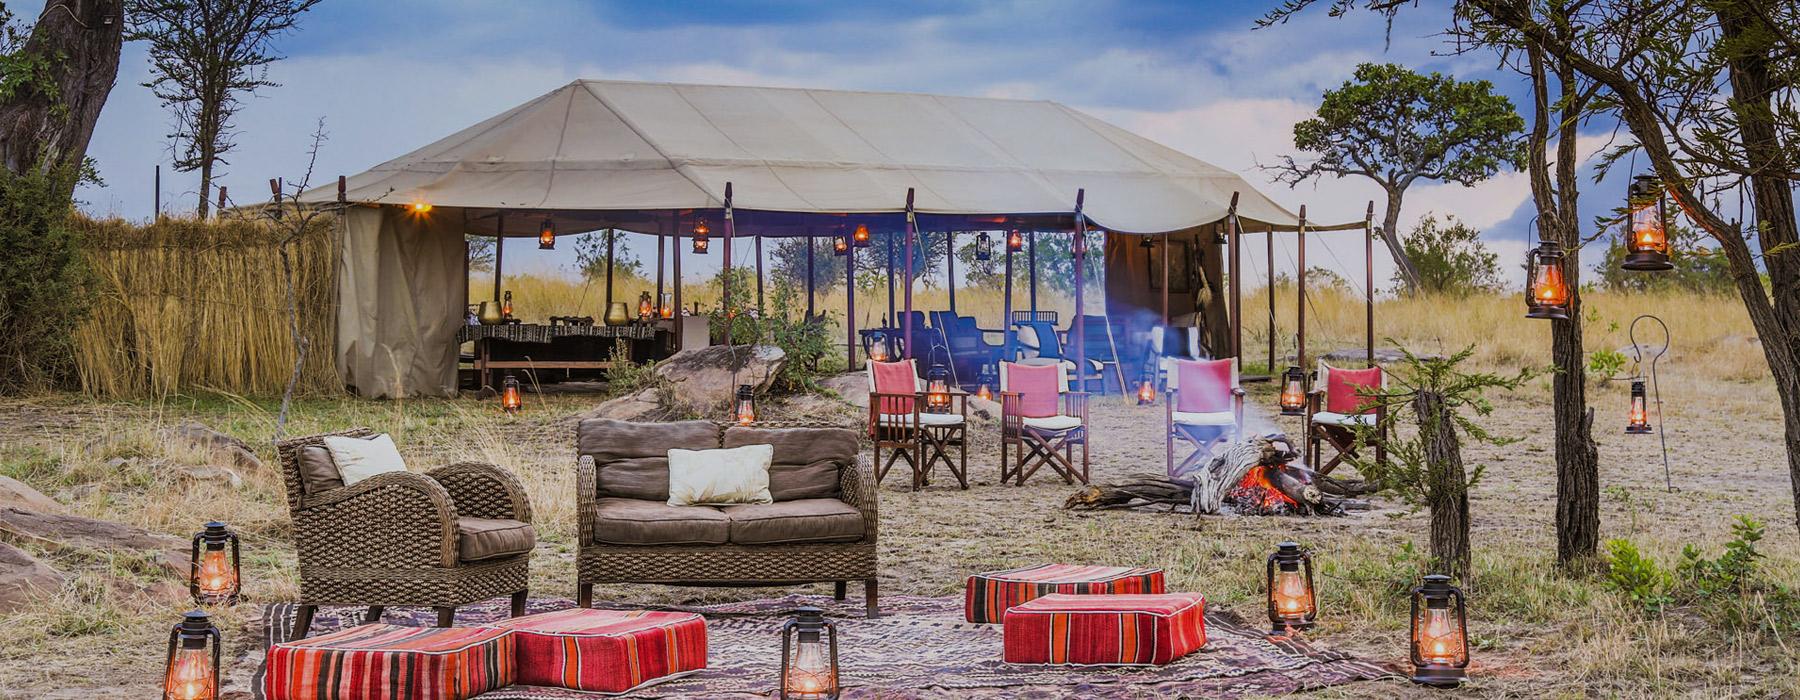 3 Days Tanzania Camping Safari